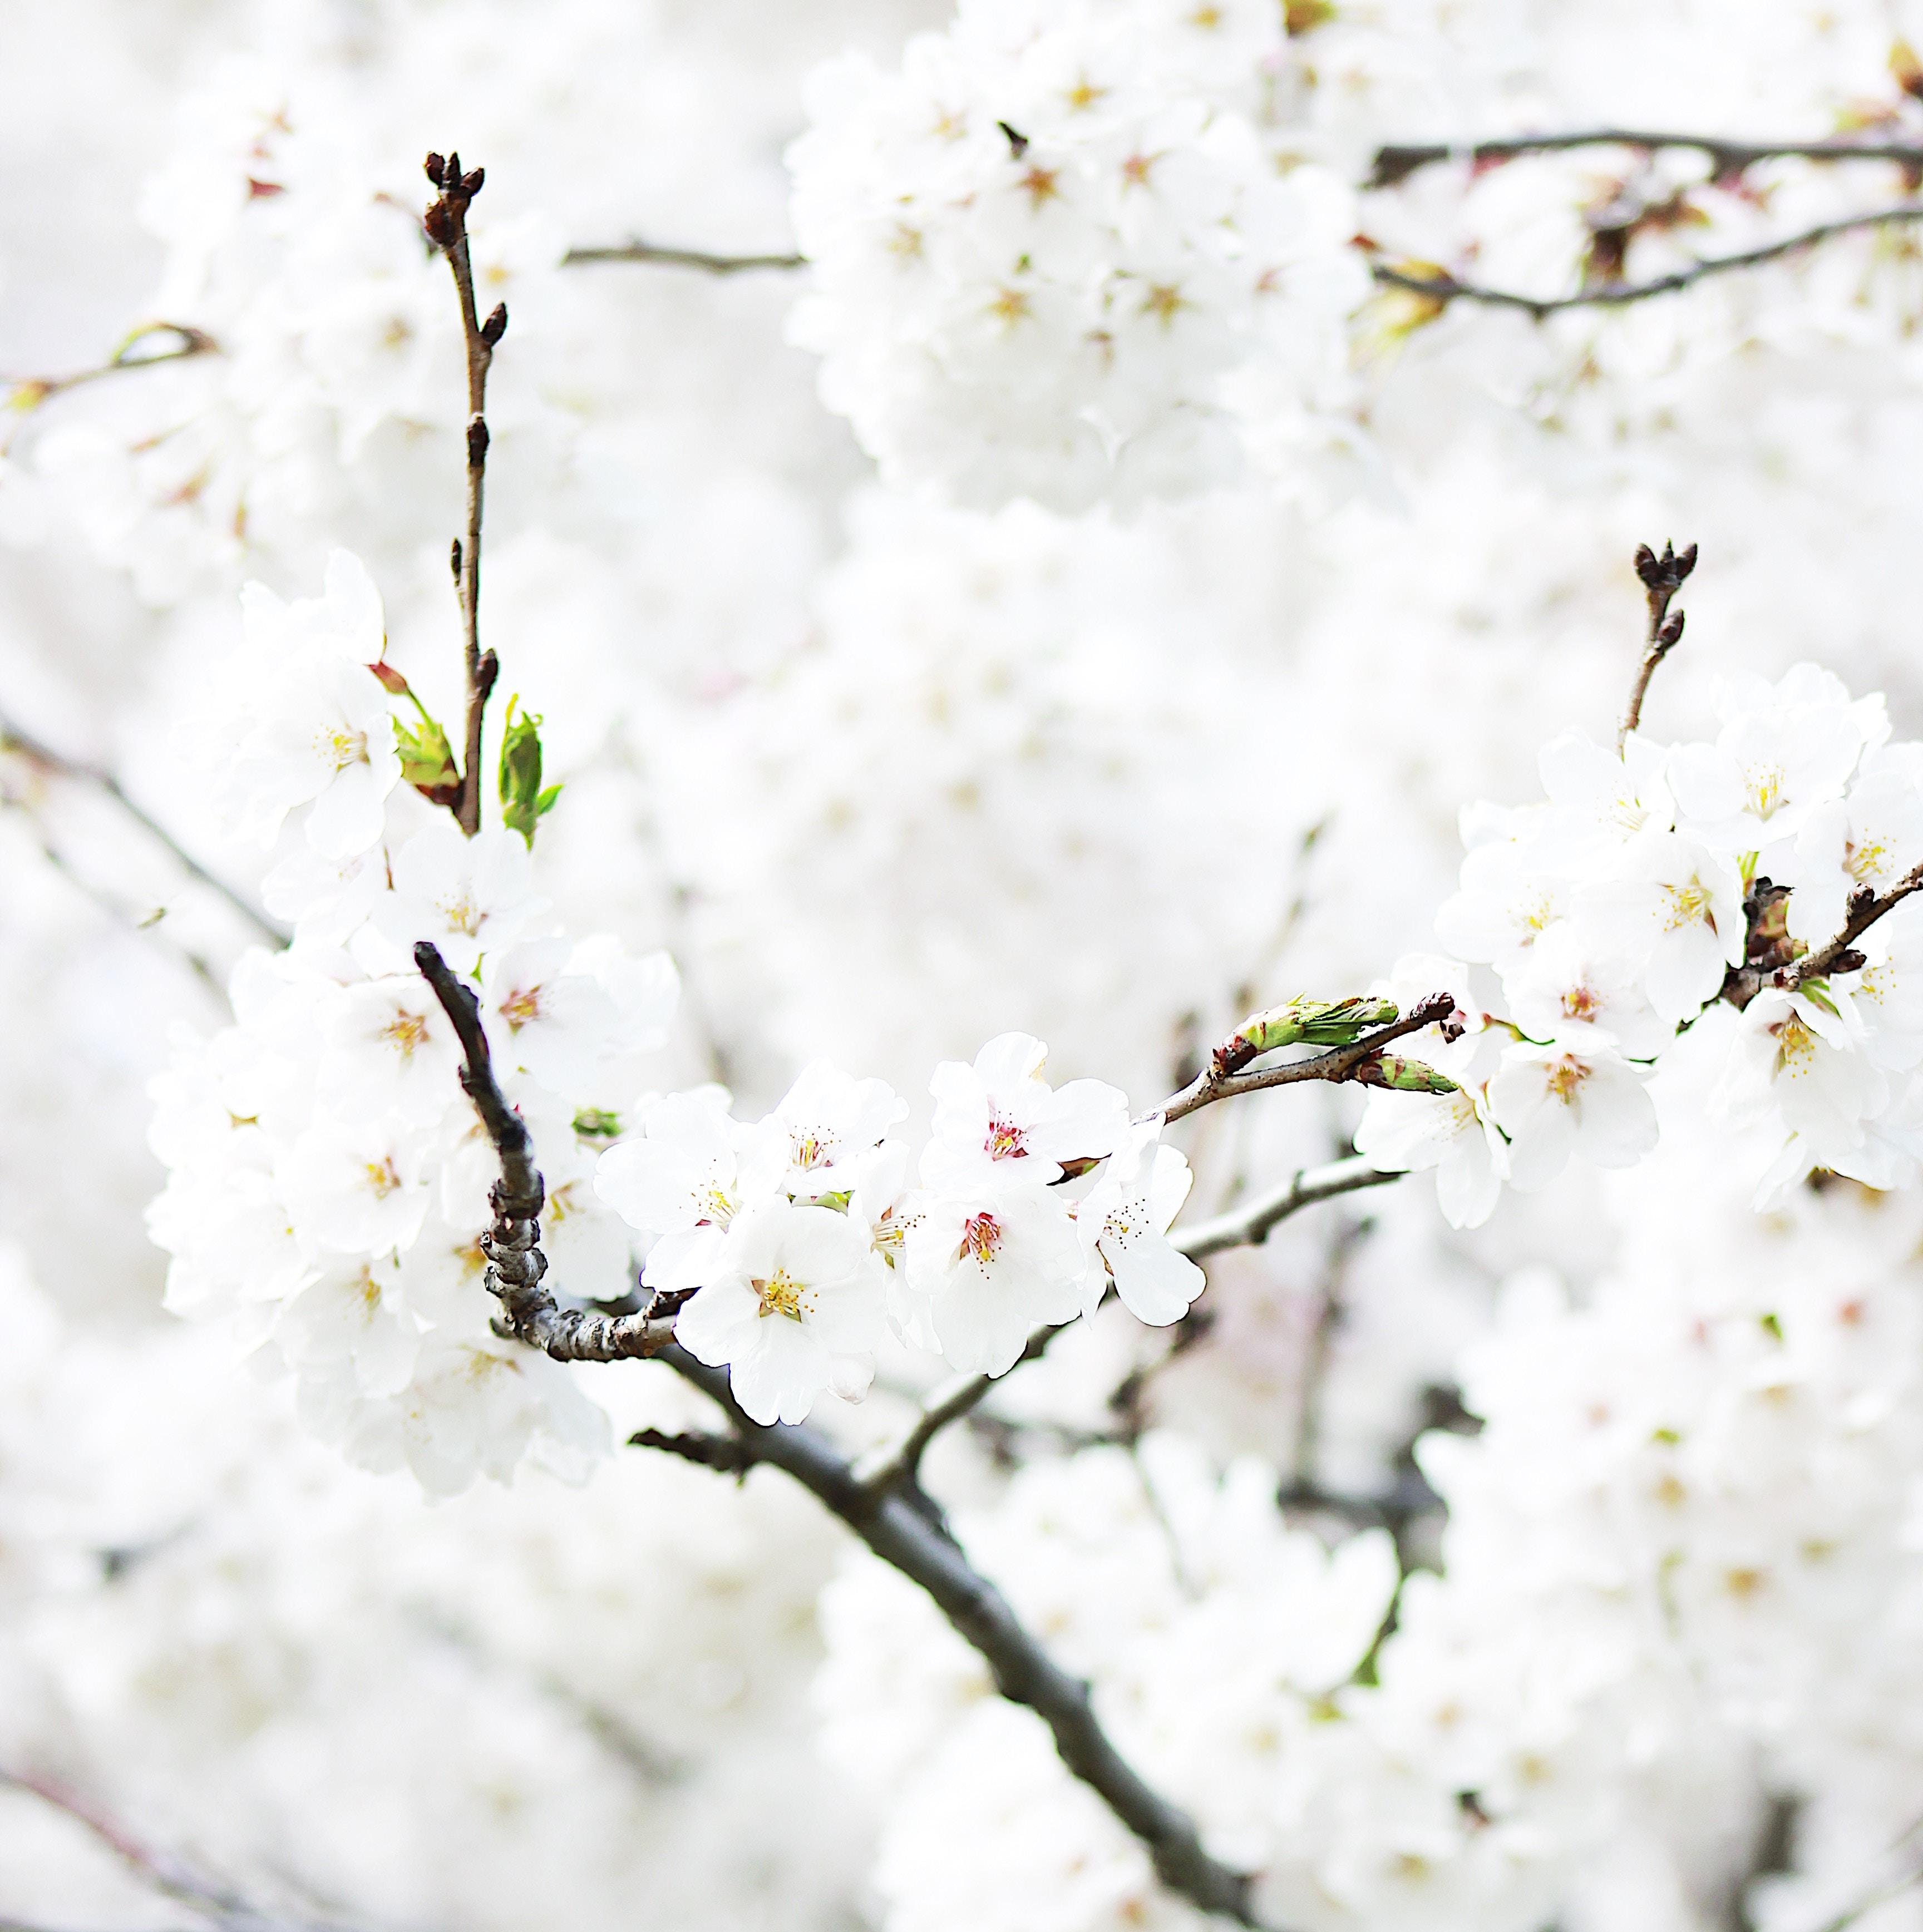 pohon cabang mekar musim dingin menanam bunga daun bunga musim semi bunga sakura ranting gambar keren